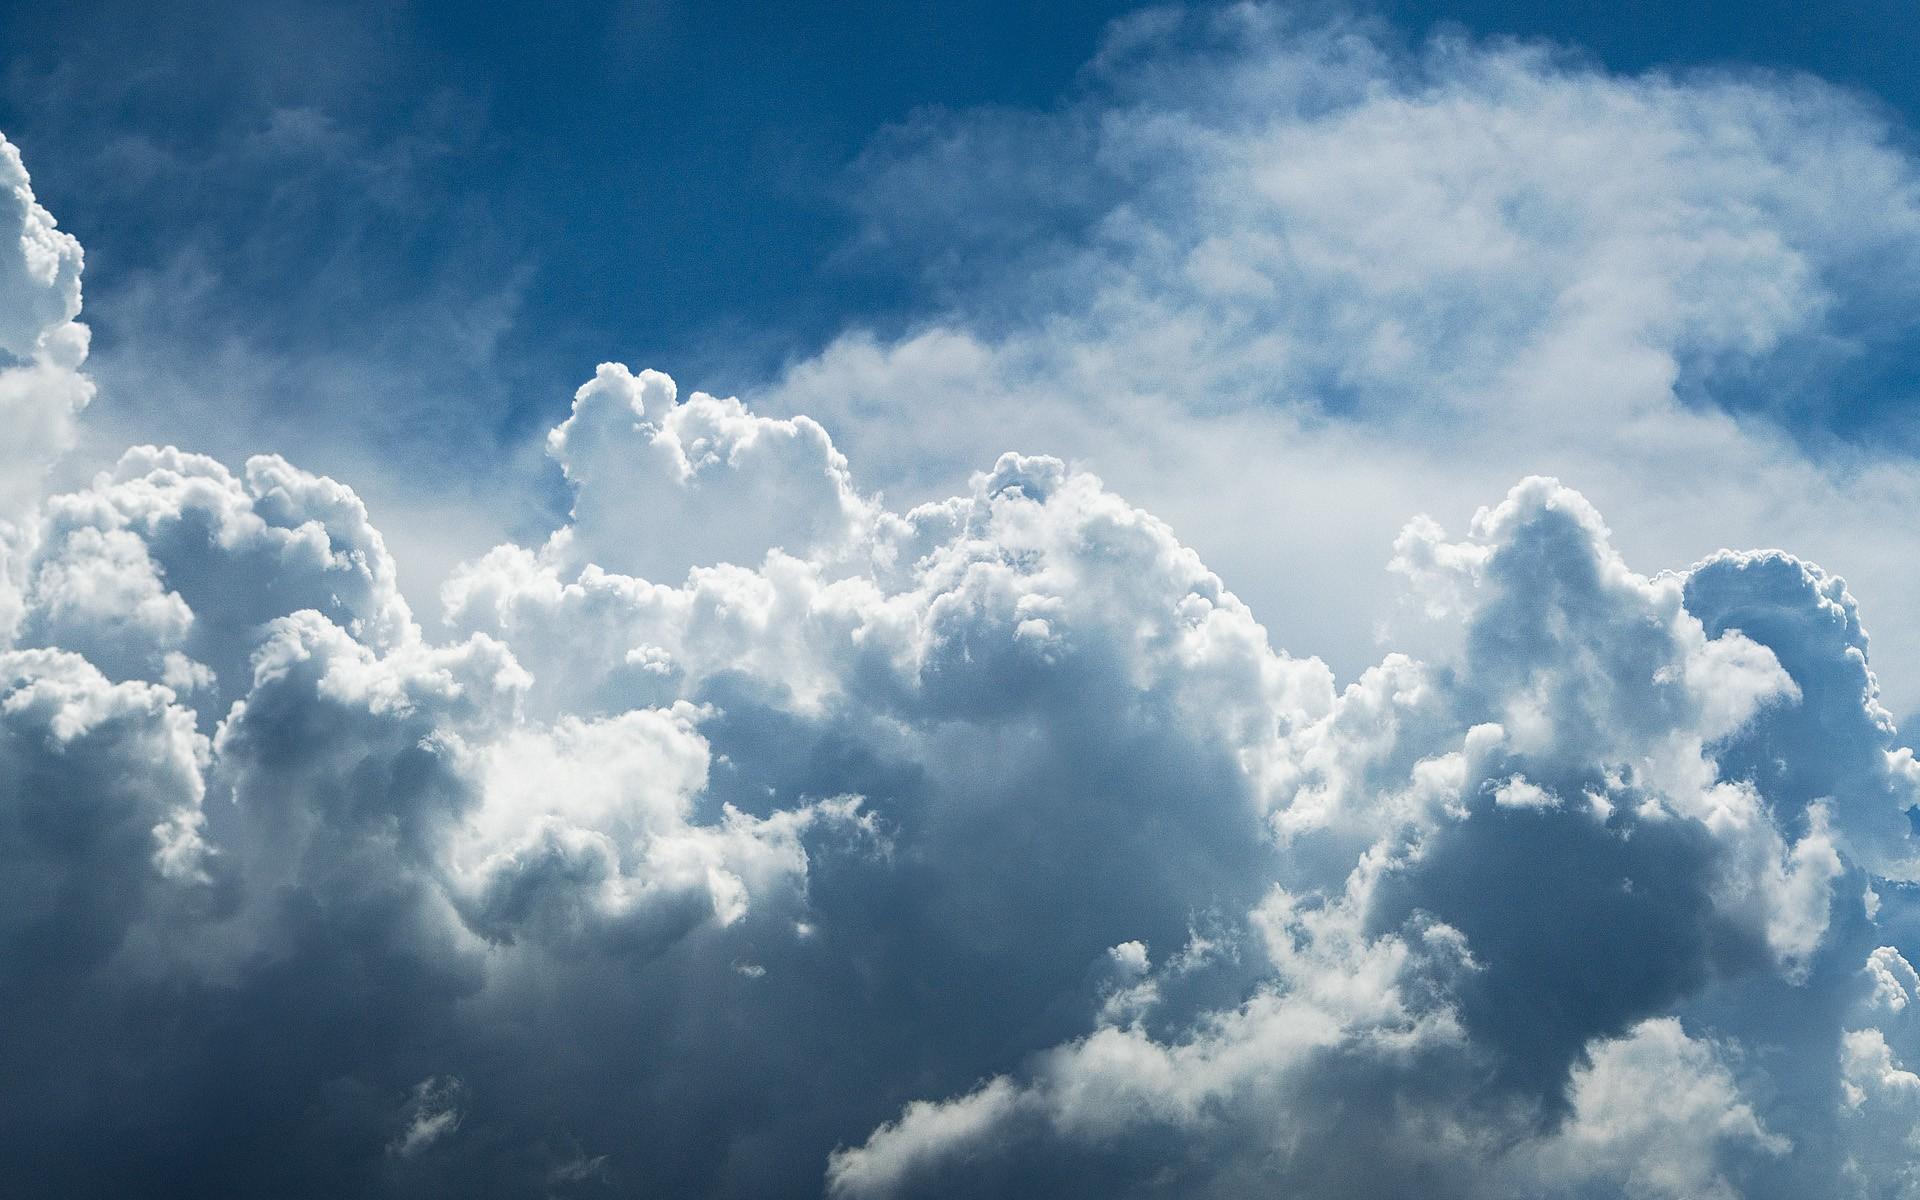 wallpaperstocknetblue clouds wallpapers 27853 1920x1200jpg 1920x1200